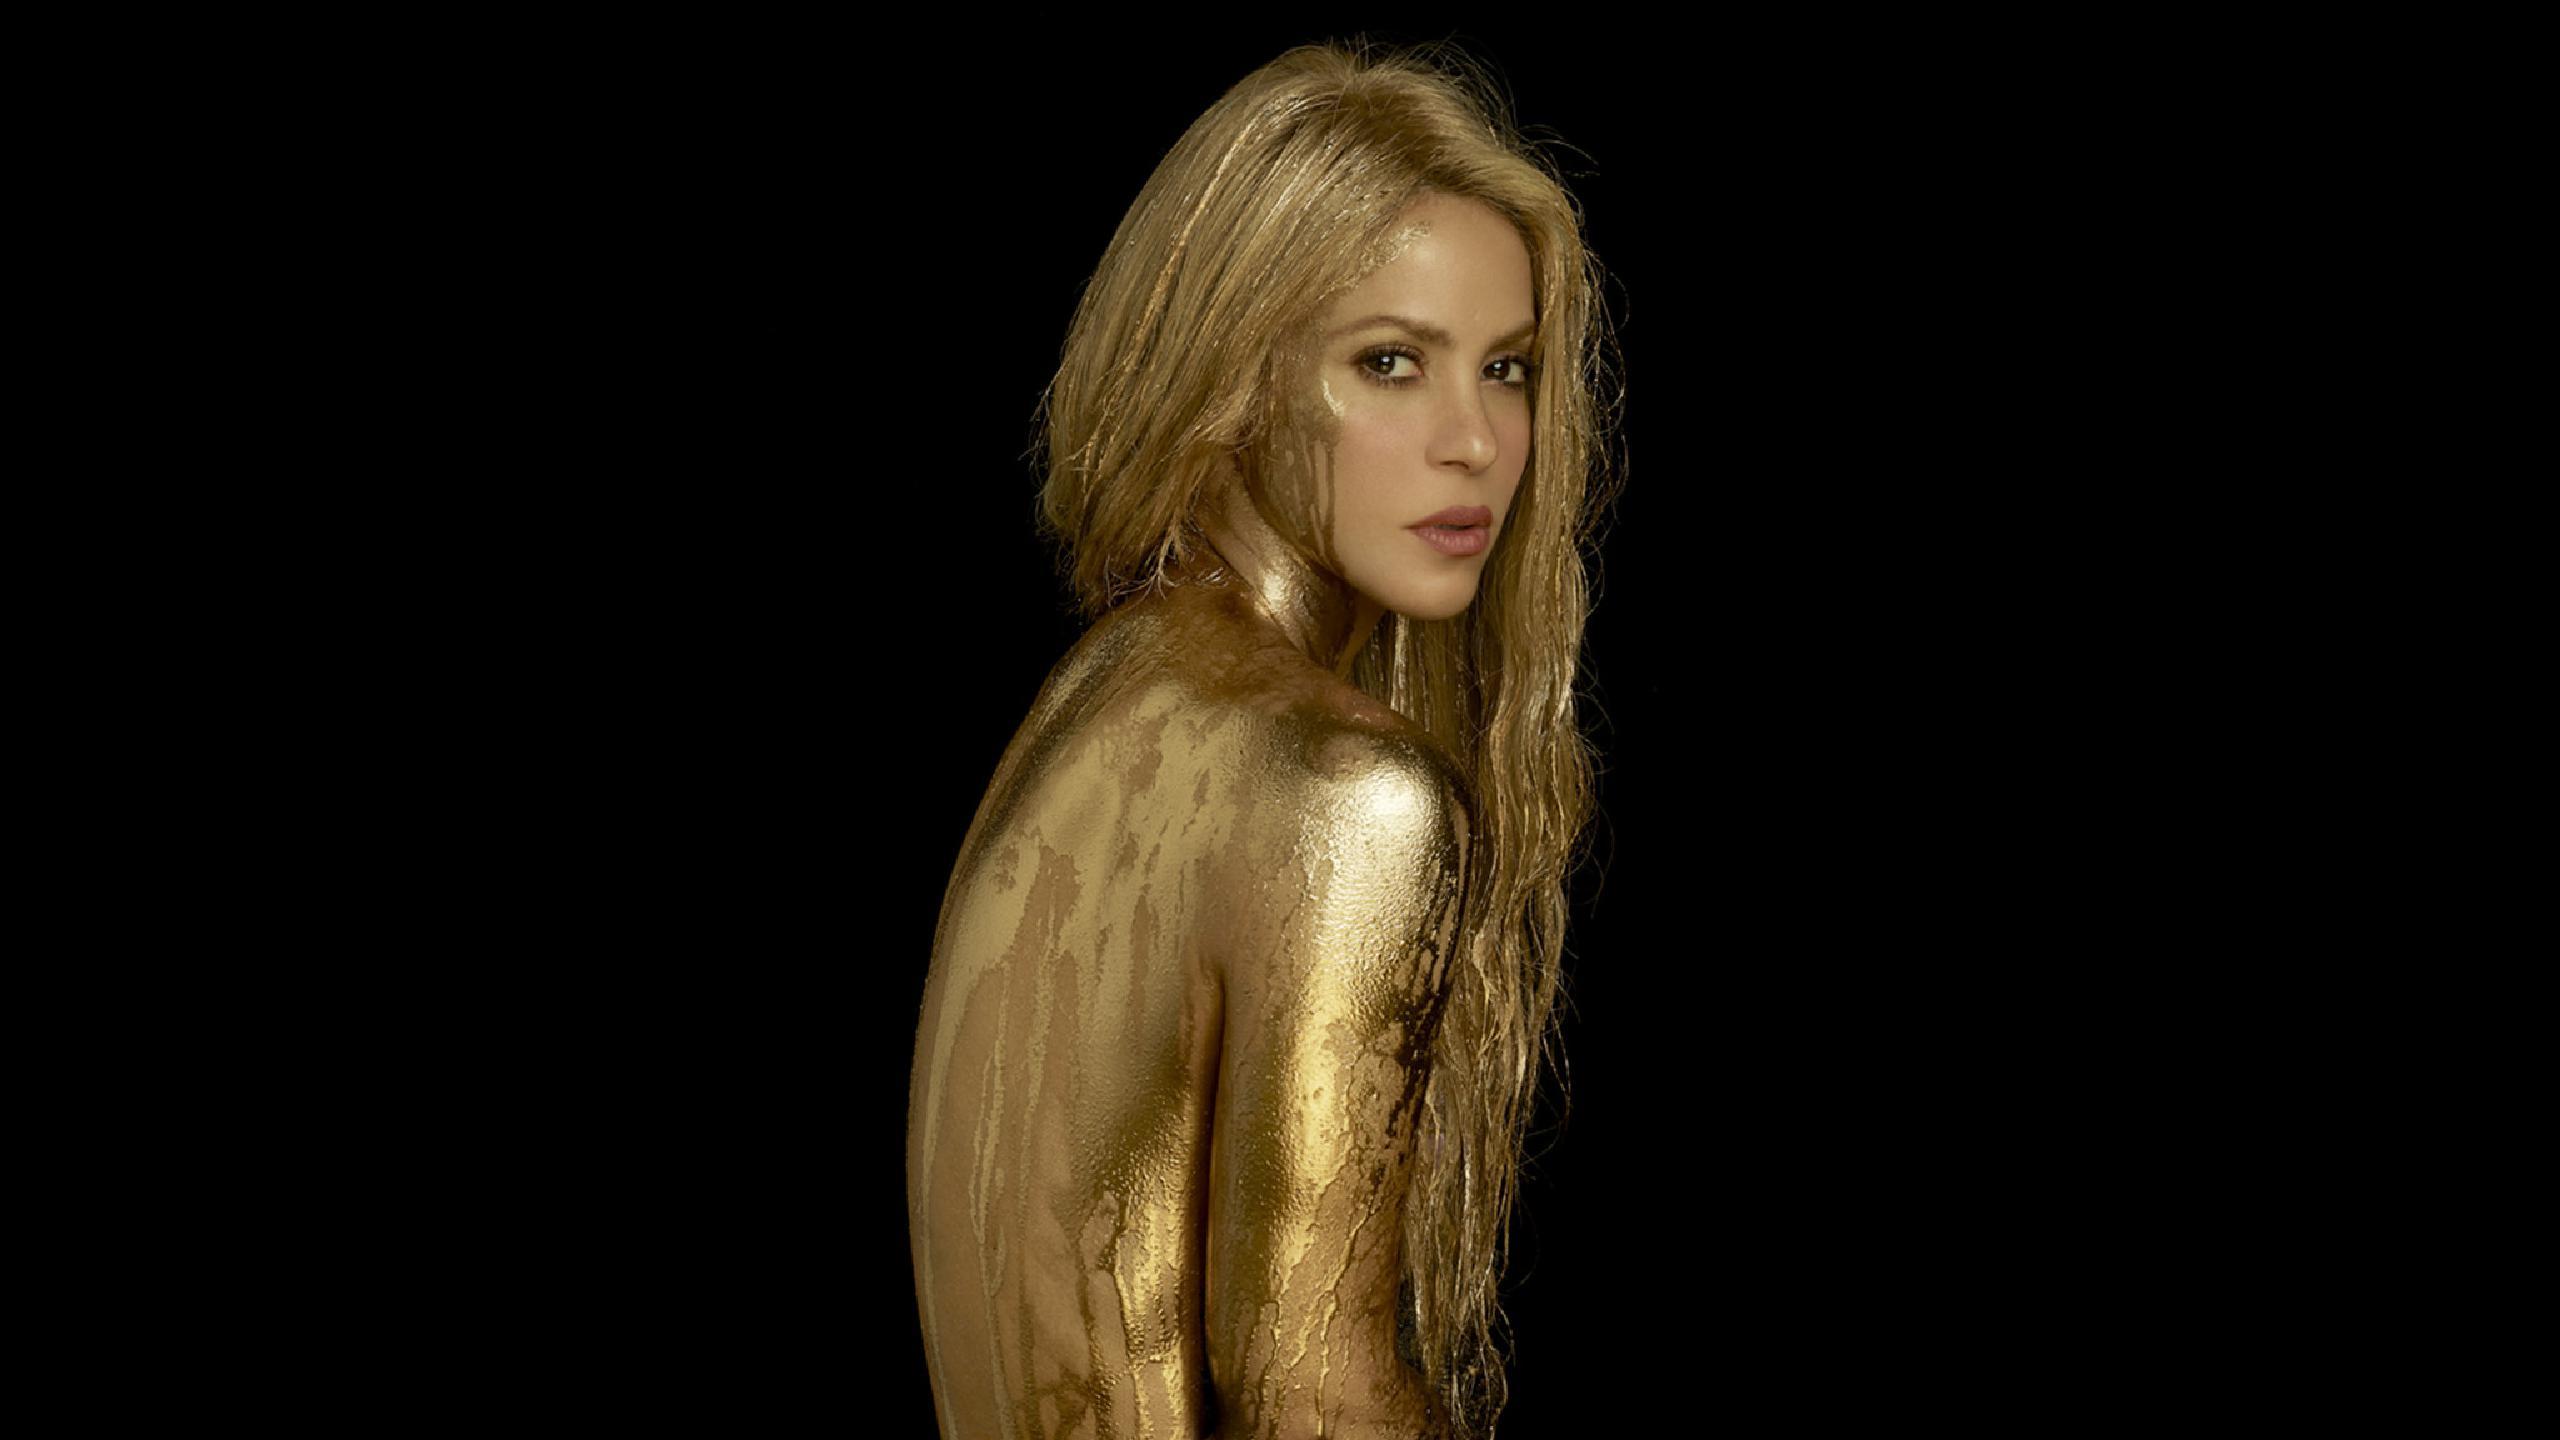 Shakira Tour 2020 Usa Shakira tour dates 2019 2020. Shakira tickets and concerts | Wegow